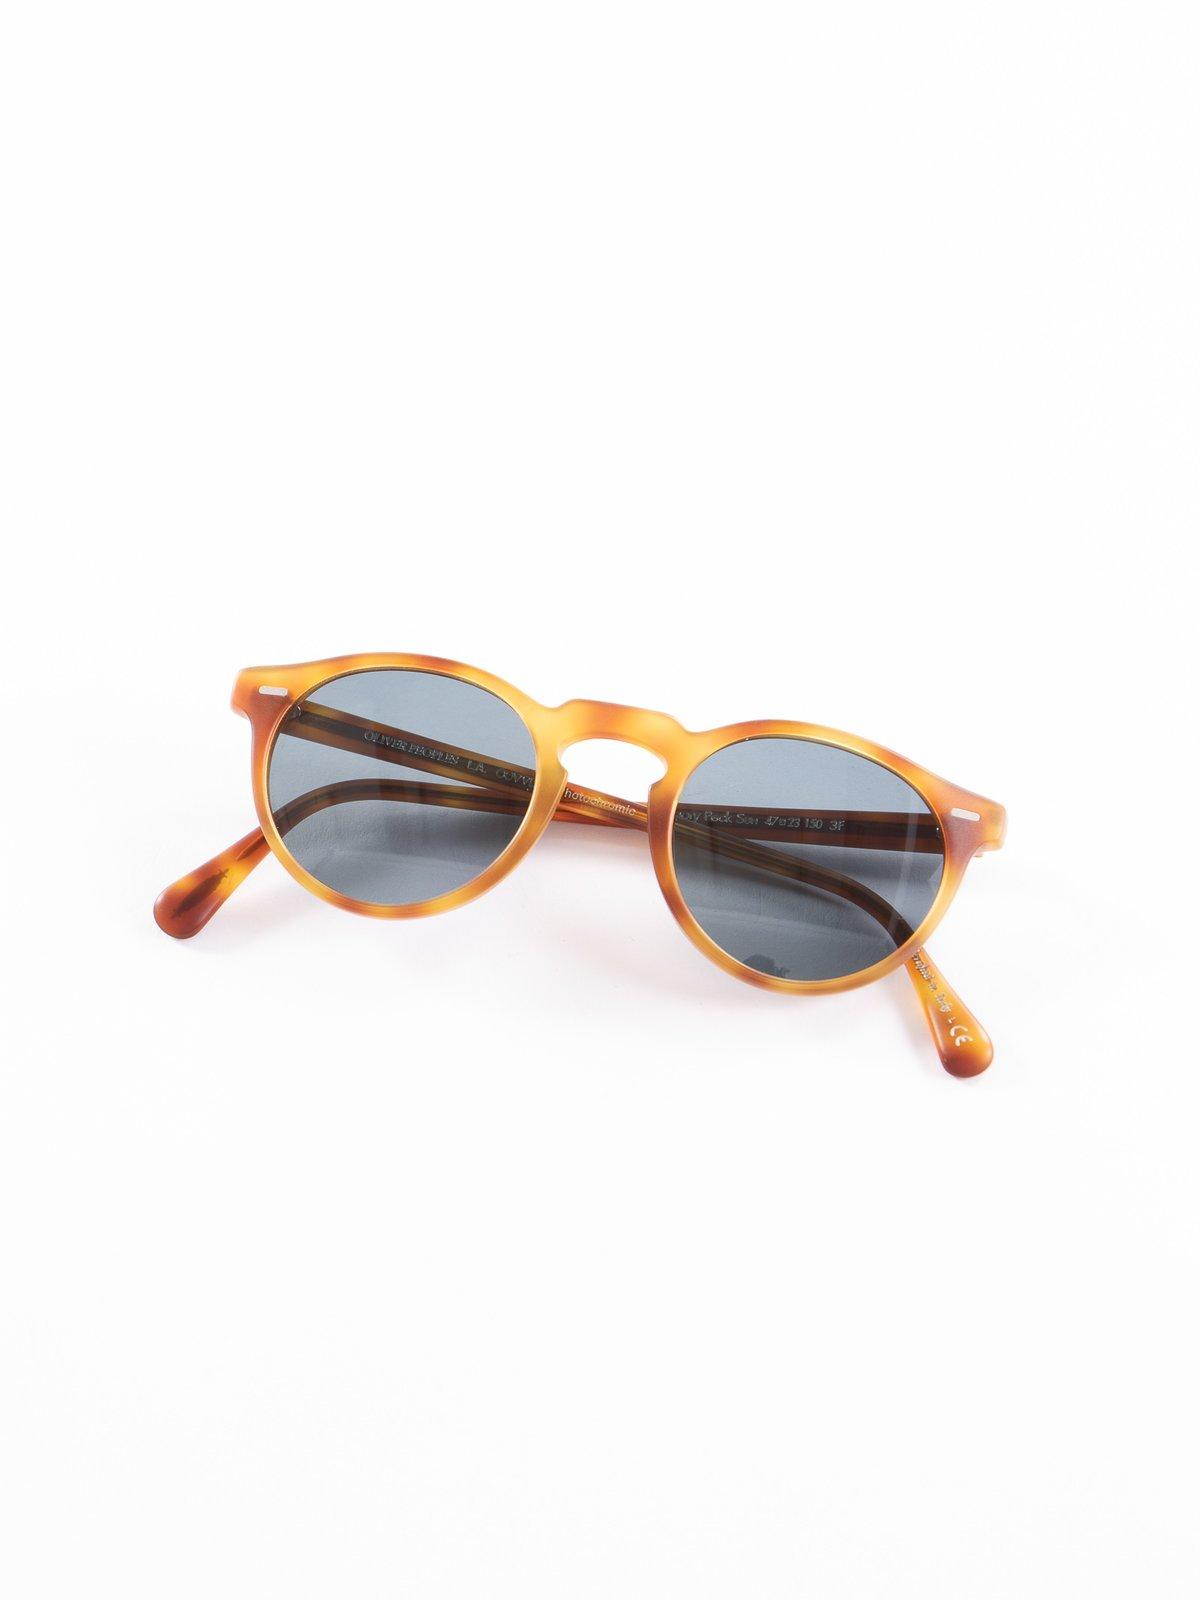 Semi–Matte LBR/Blue Photochromic Gregory Peck Sunglasses - Image 1